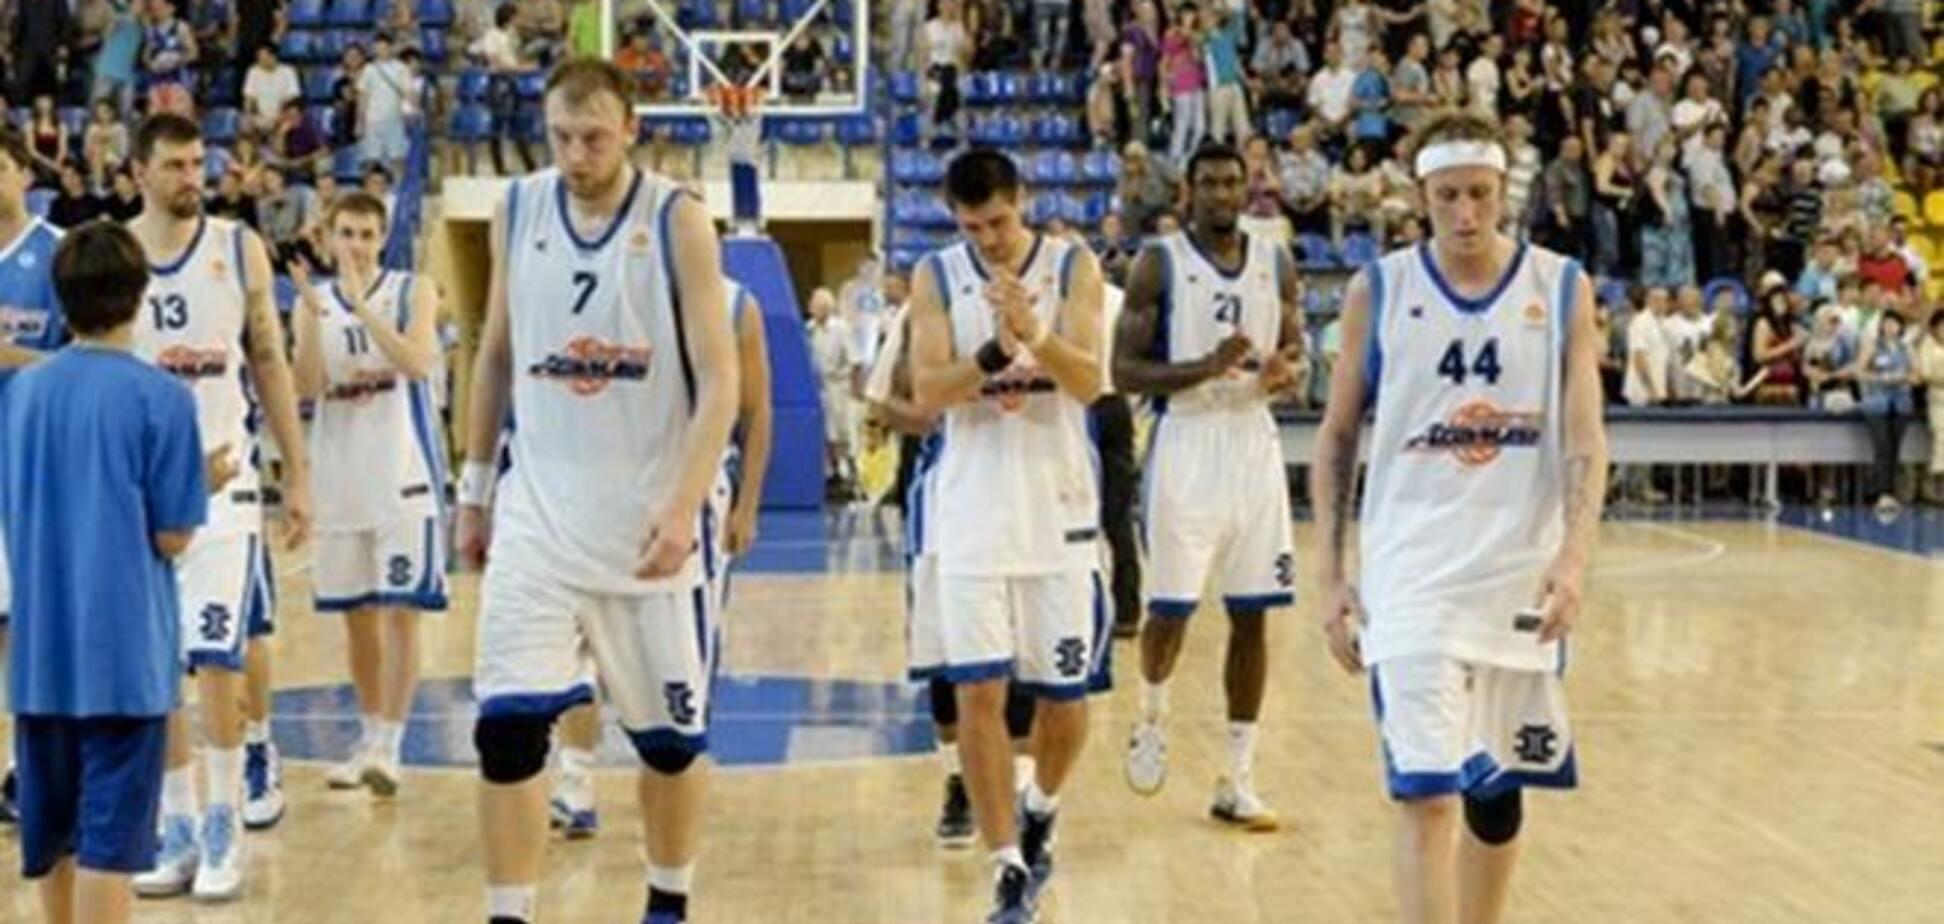 Суперлига присудила 'Азовмашу' техпоражение за отказ проводить матч с 'Днепром'